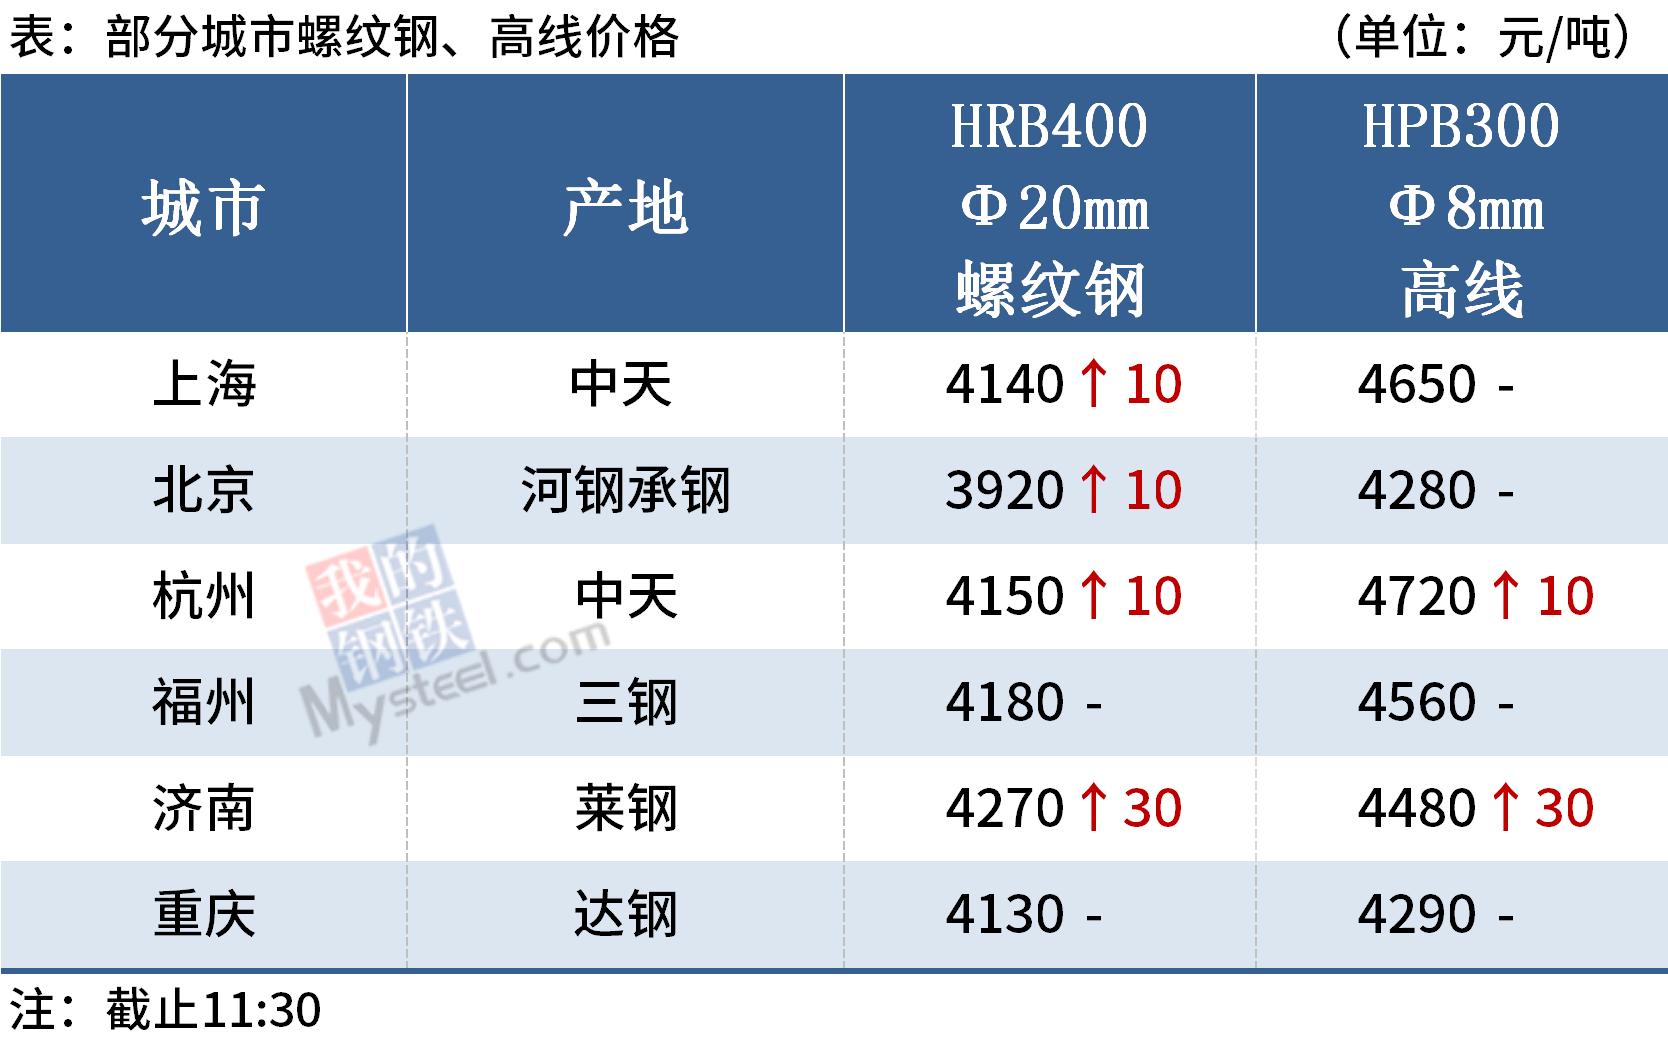 Mysteel午报:钢价多数上涨,期螺盘中创年内新高